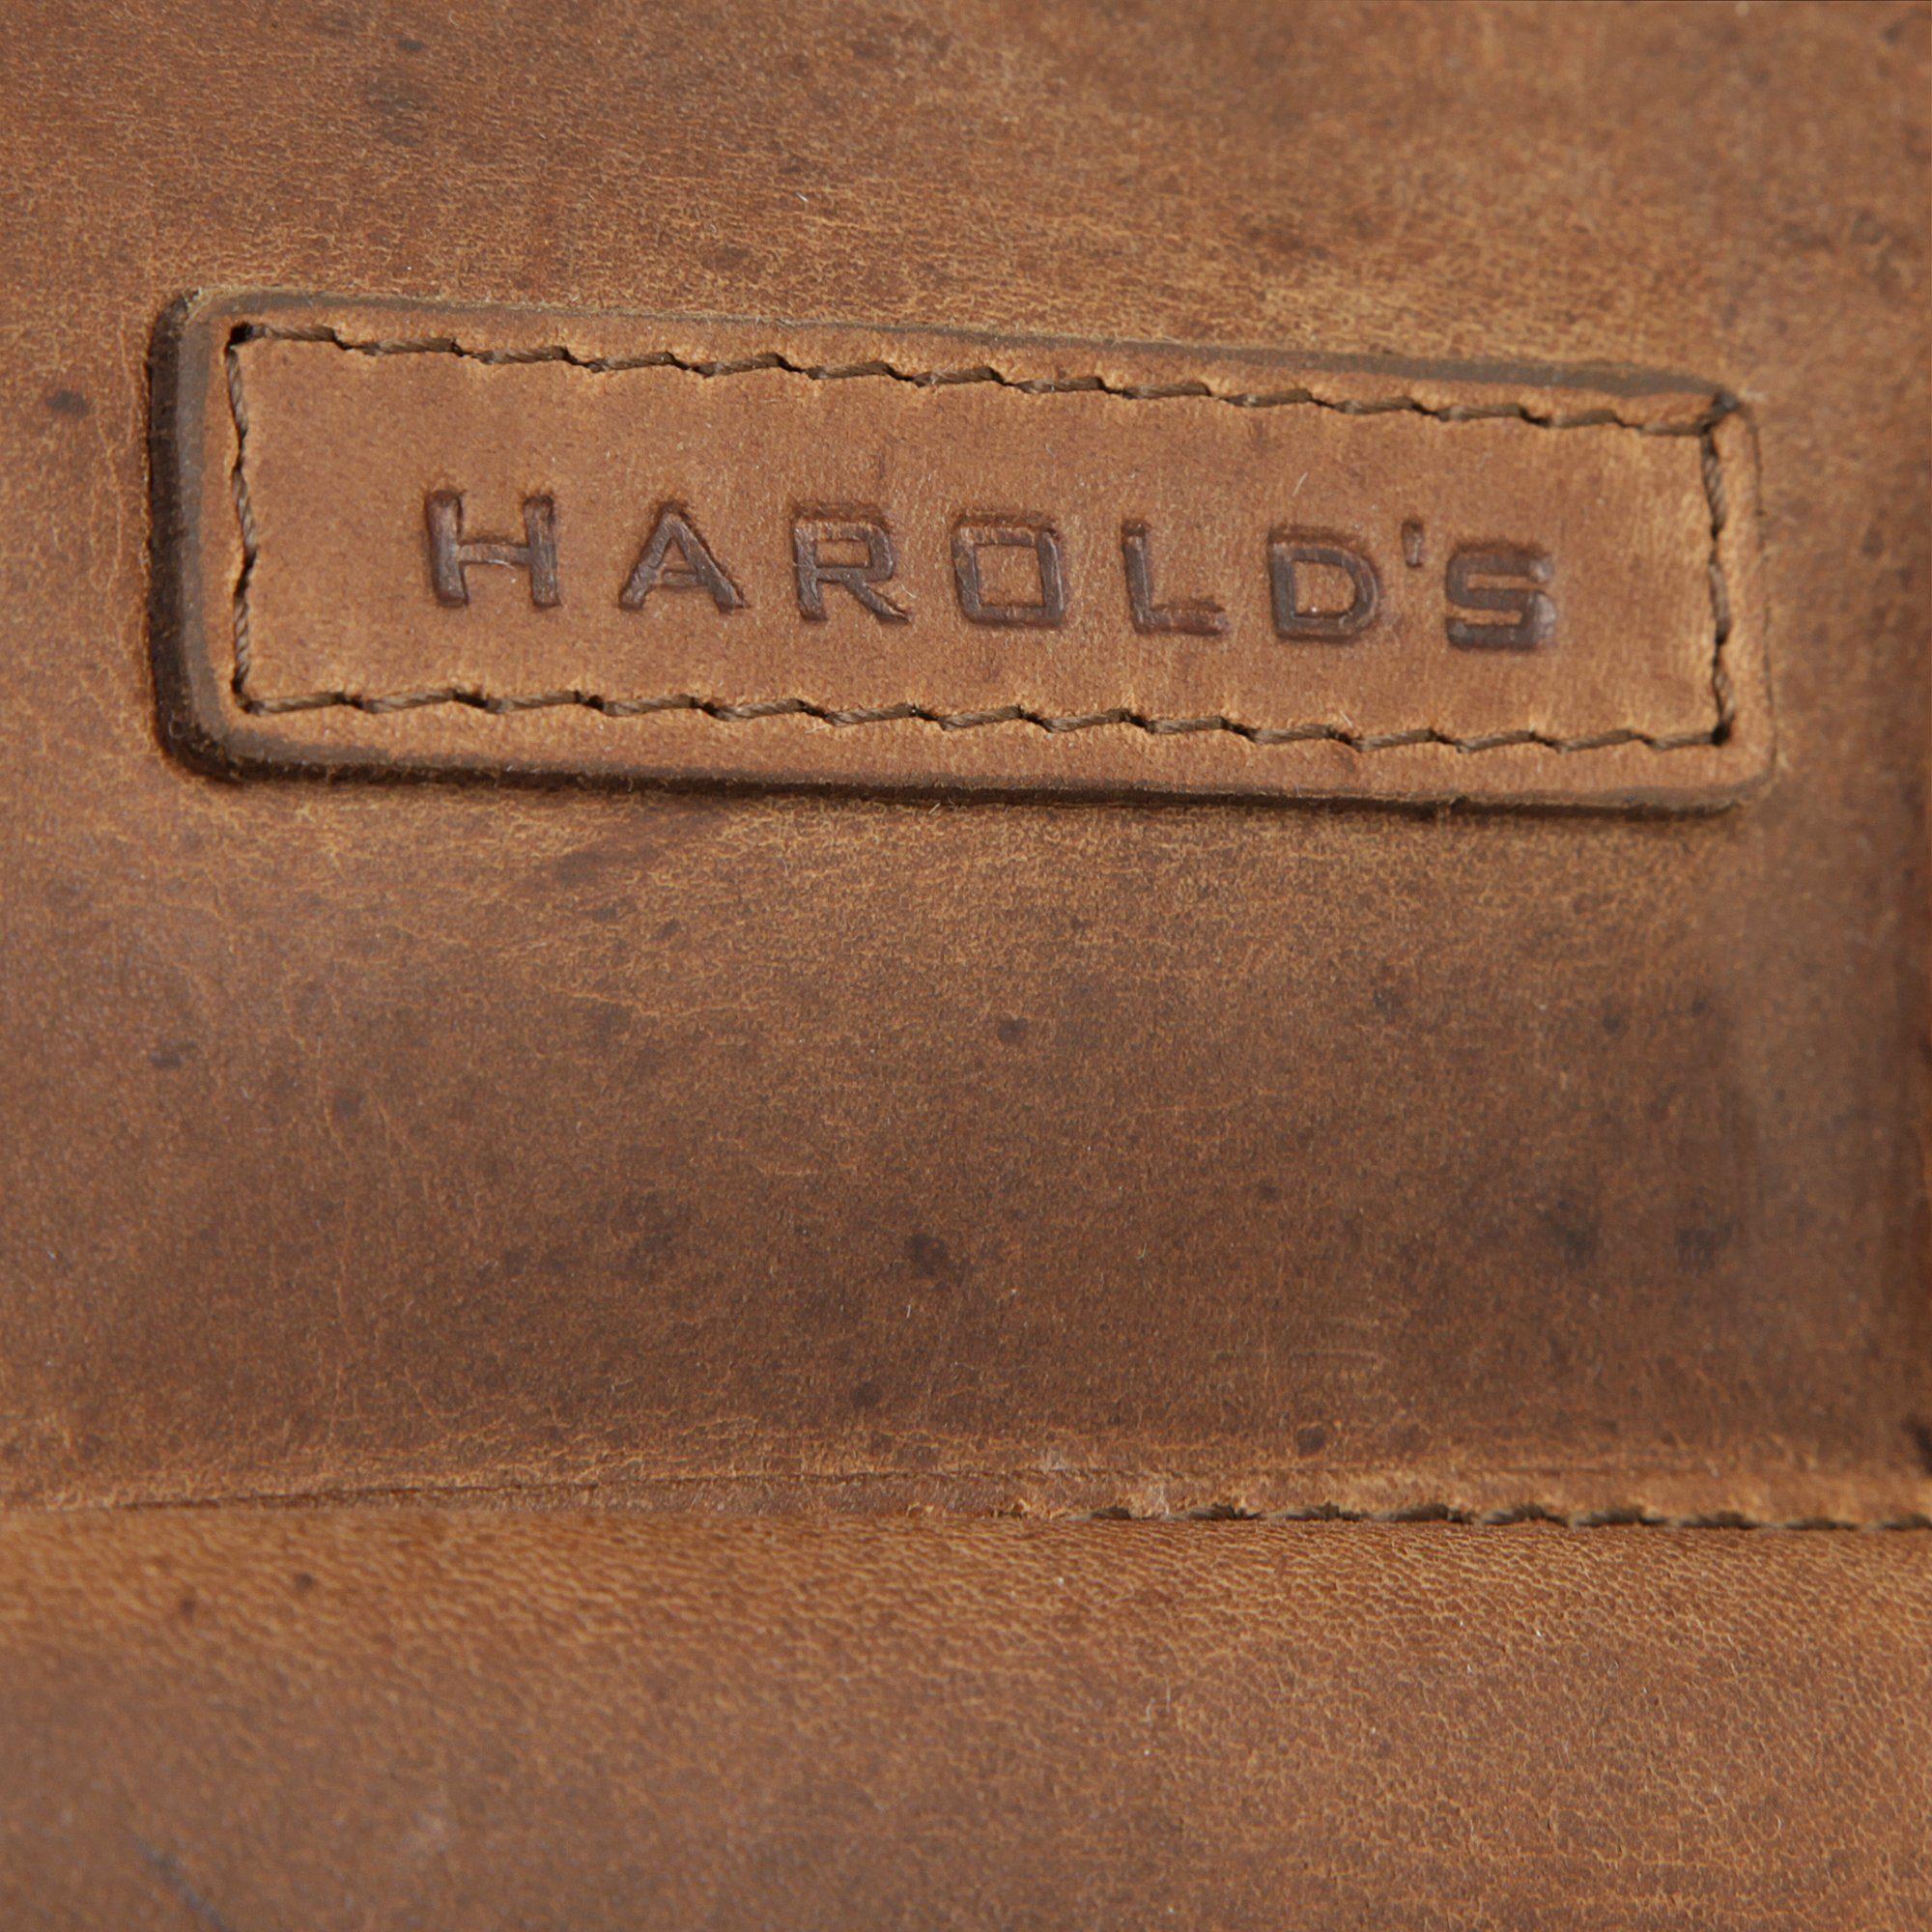 Harold's »antik« Laptoprucksack Harold's Laptoprucksack 4vS41